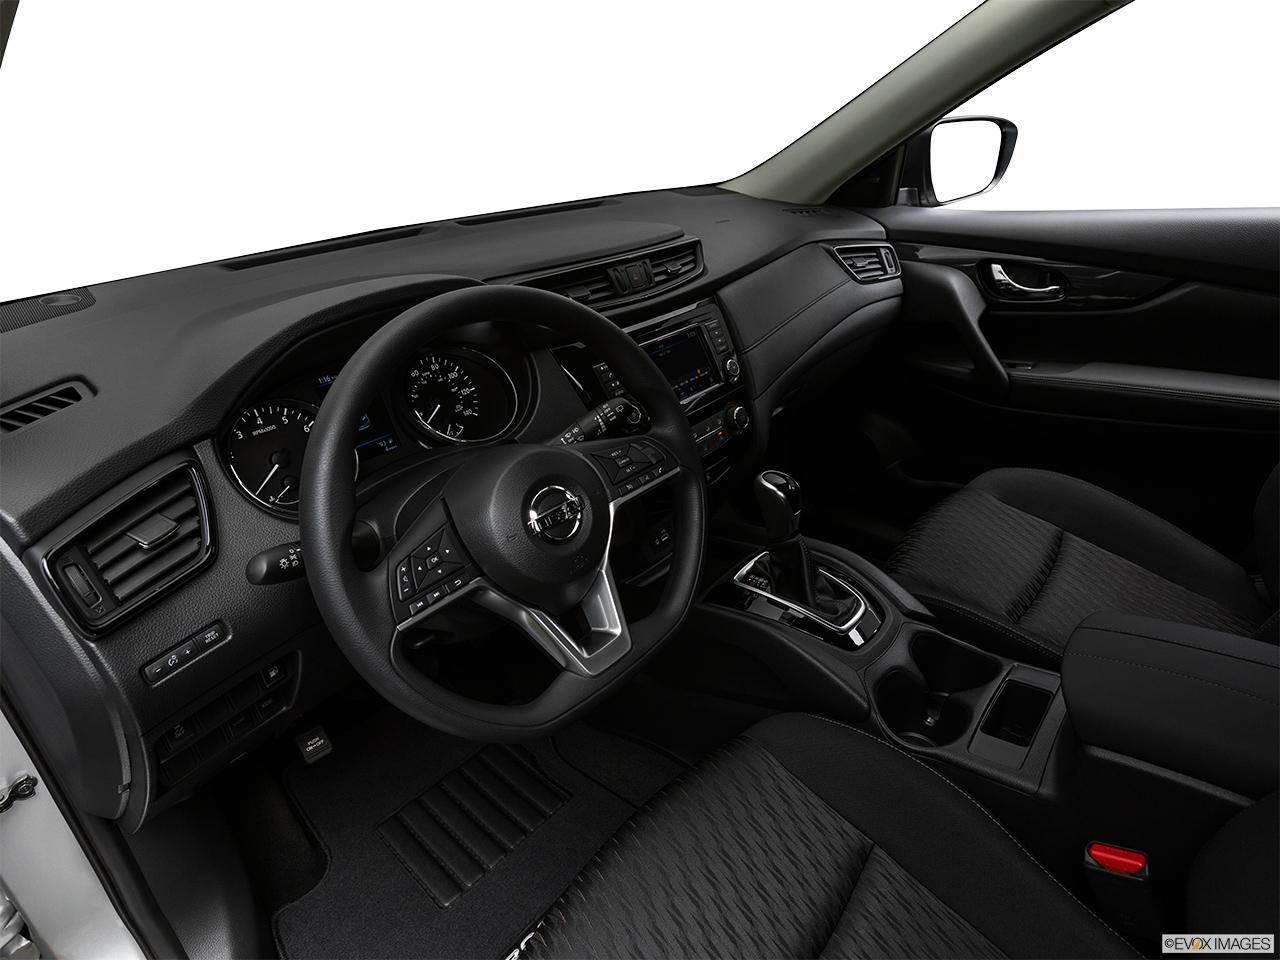 Nissan X-Trail 2018 2.5 SV 4WD 7-Seater in Qatar: New Car ...